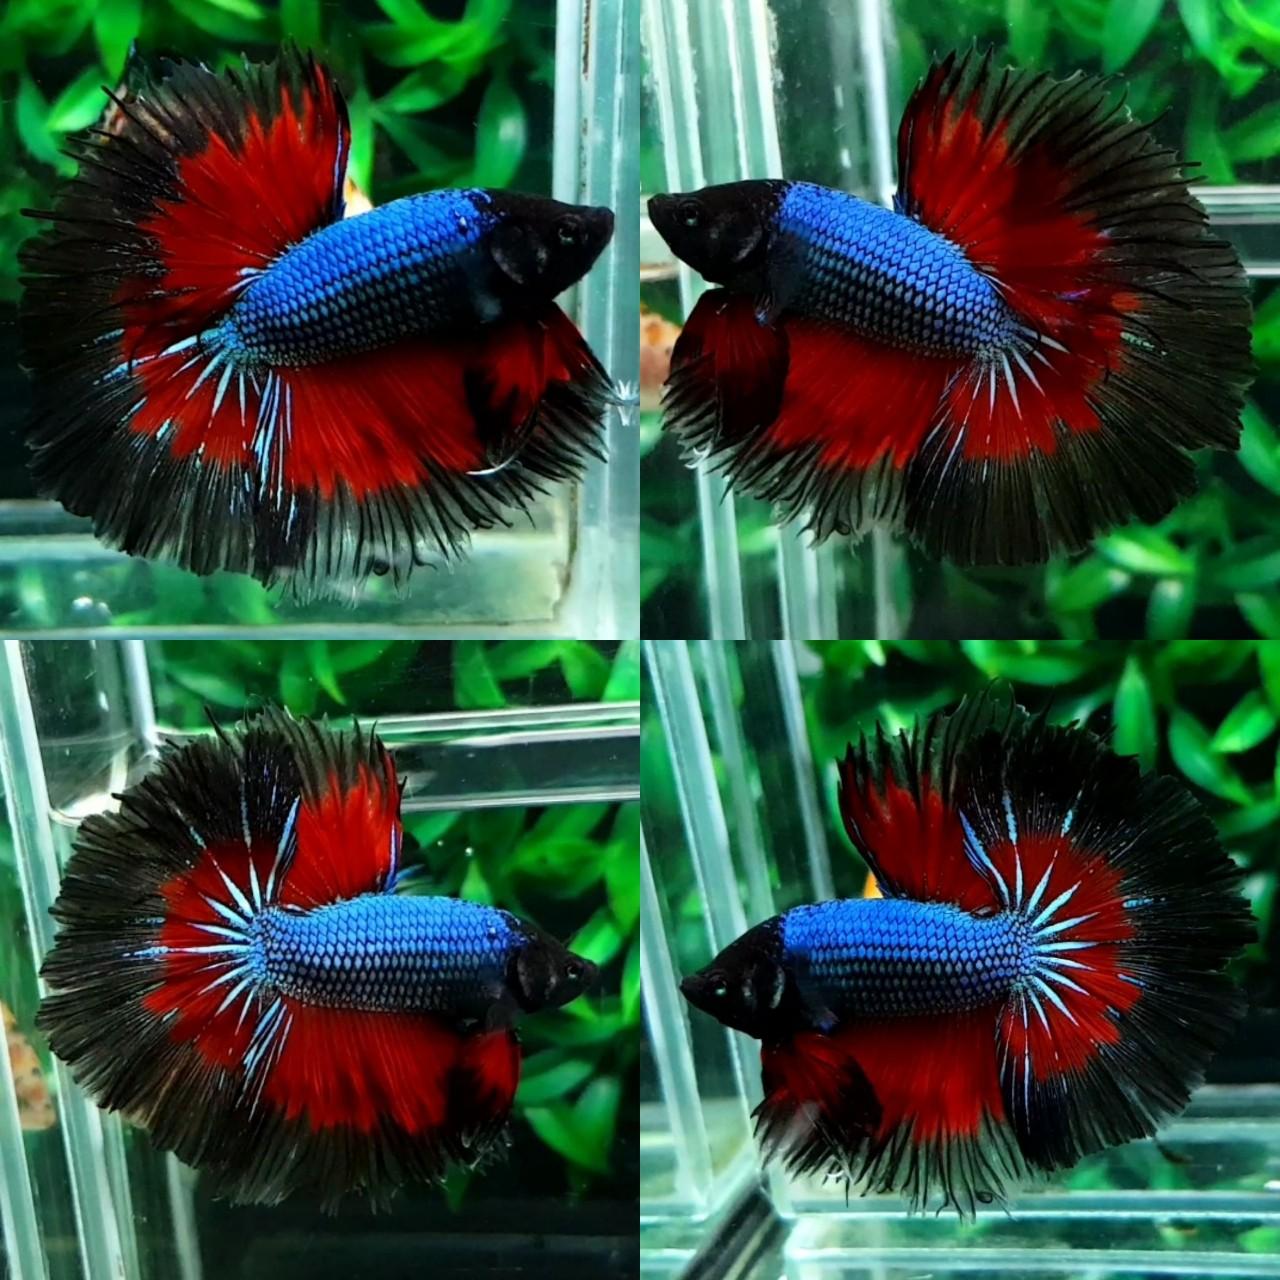 fwbettashm3102152026 - OHM male Blue Red Black Marble By Kingpetall